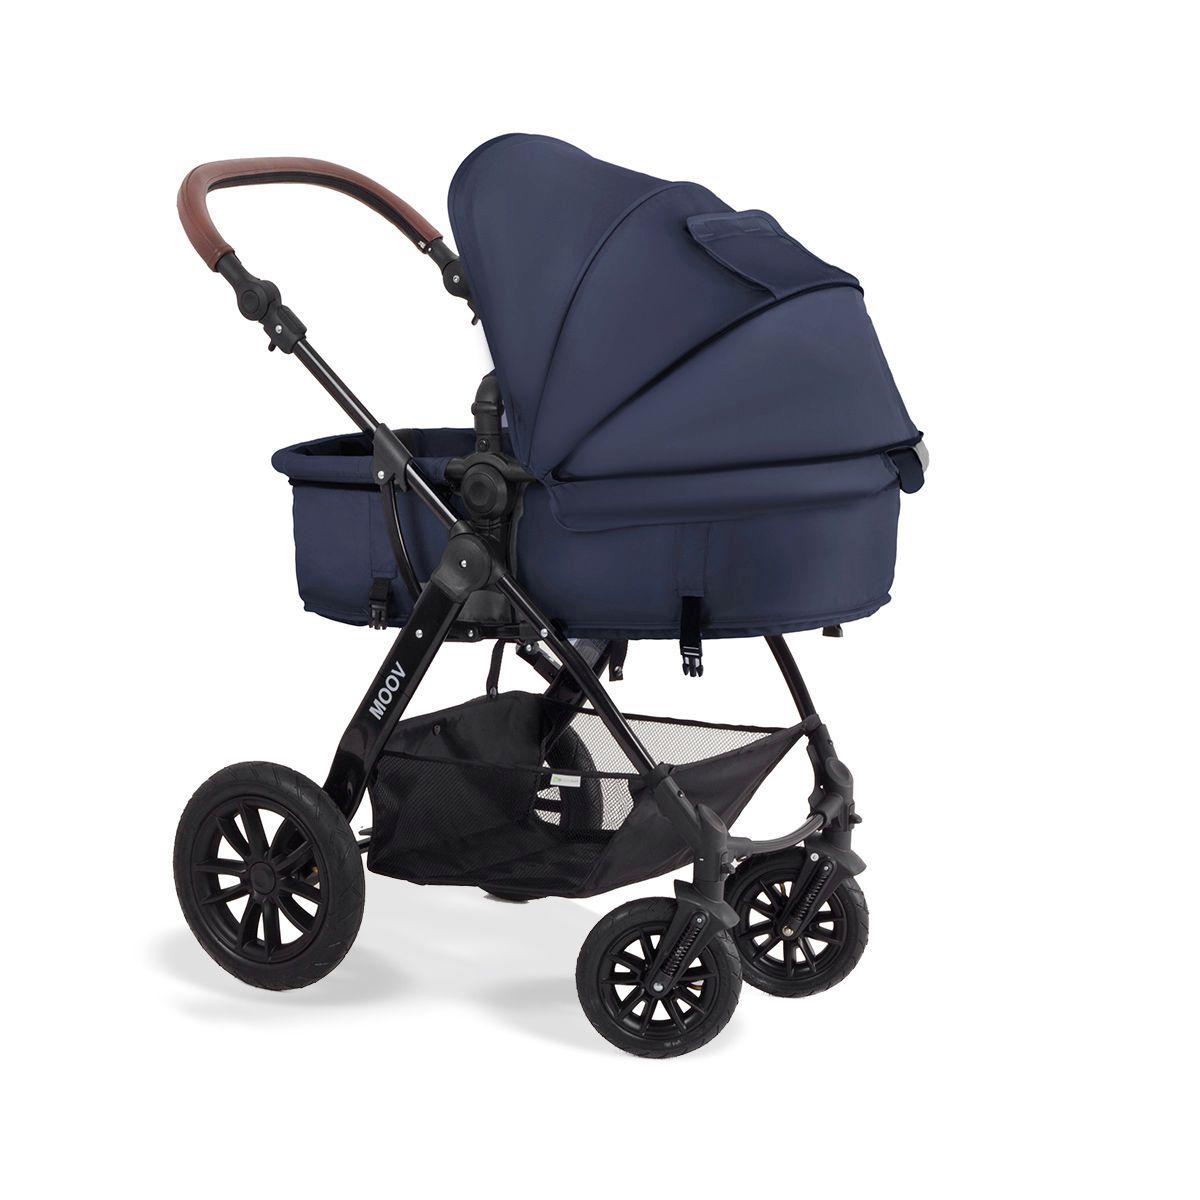 kinderkraft moov multi kinderwagen kombikinderwagen mit buggy babyschale neu ebay. Black Bedroom Furniture Sets. Home Design Ideas